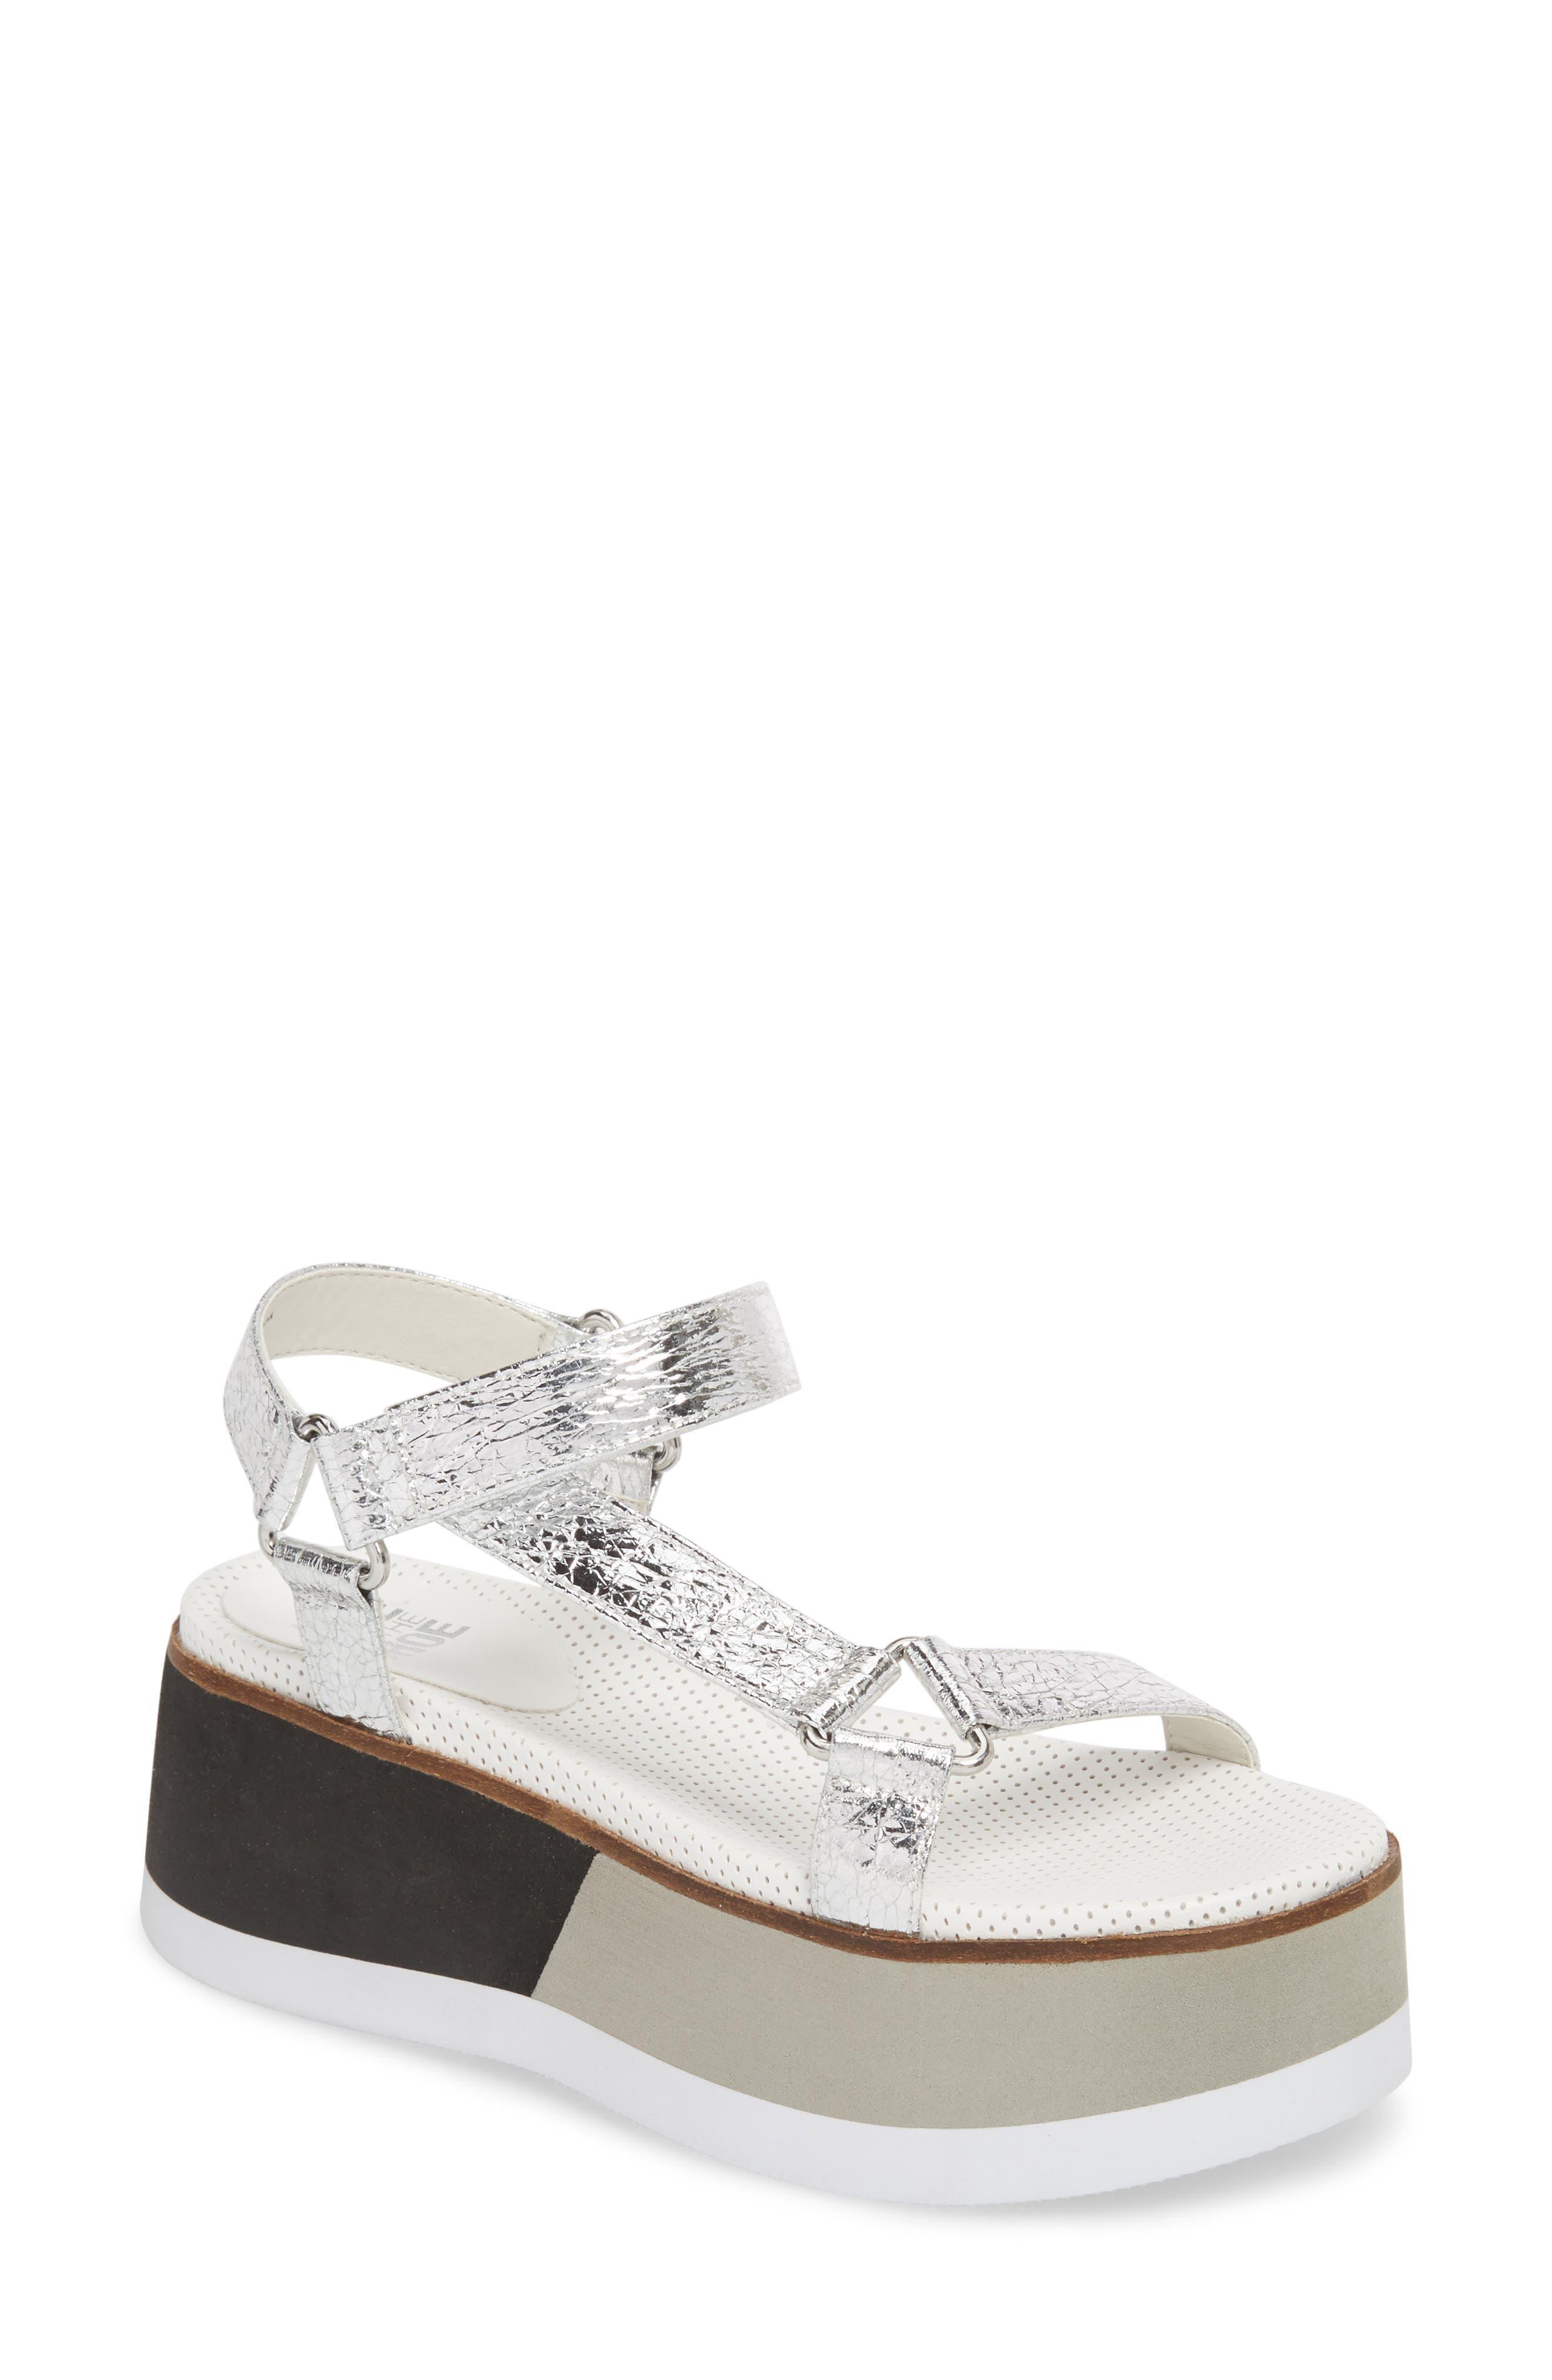 Jayden Platform Sport Sandal,                             Main thumbnail 1, color,                             Silver